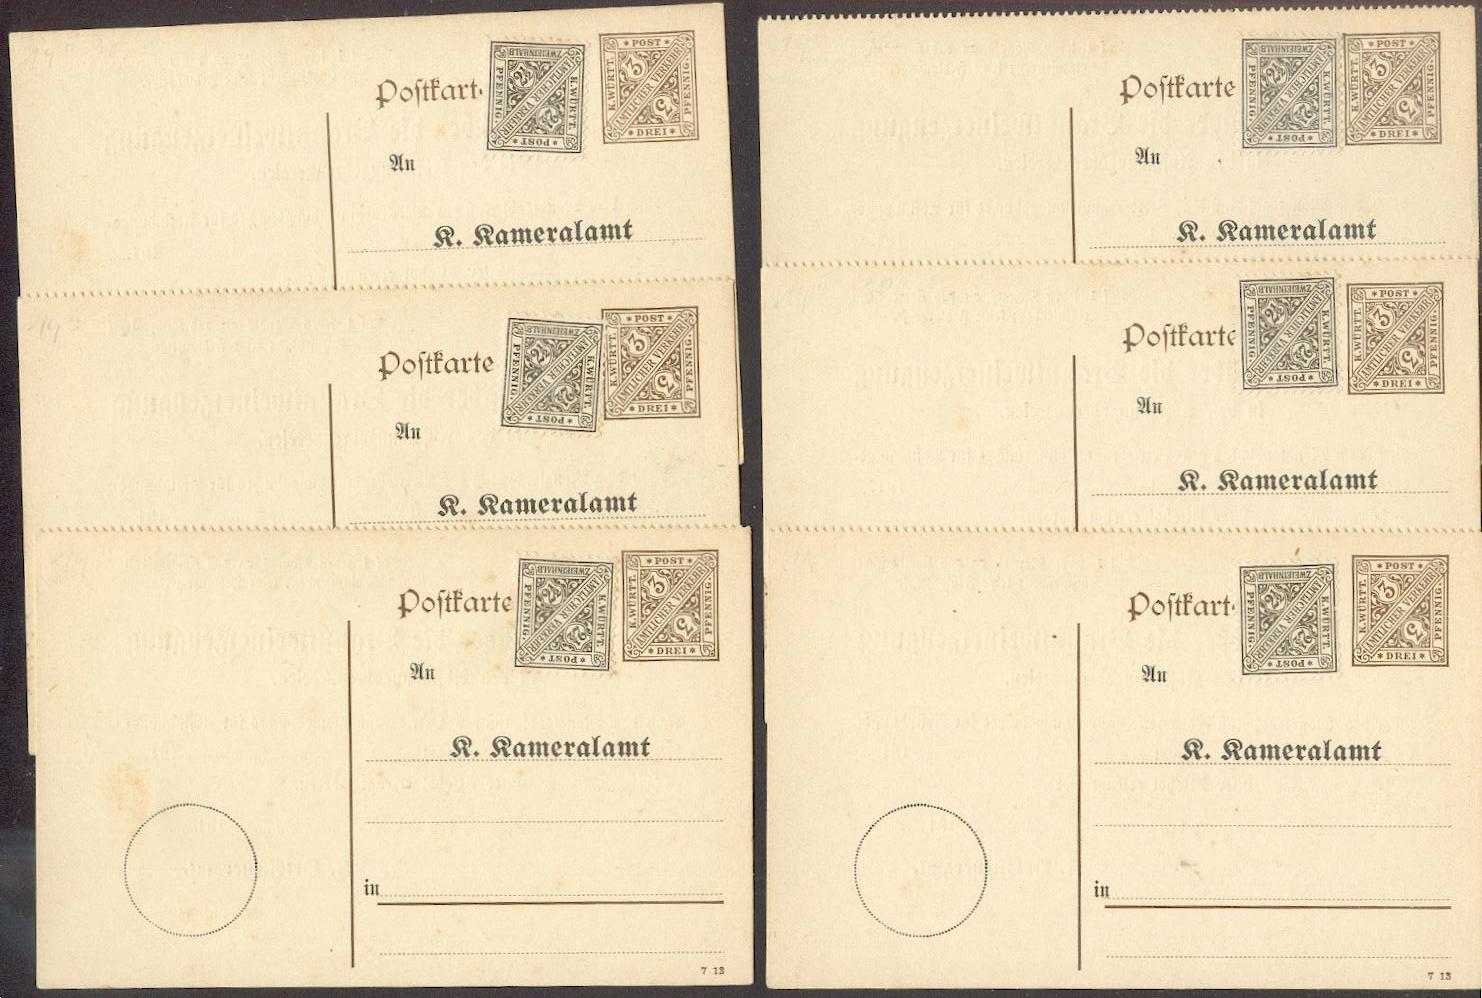 WTTBG-1900-DP42IIb-GEZAHNT-per-6-BRANNTWEINERZEUGUNG-180-19245